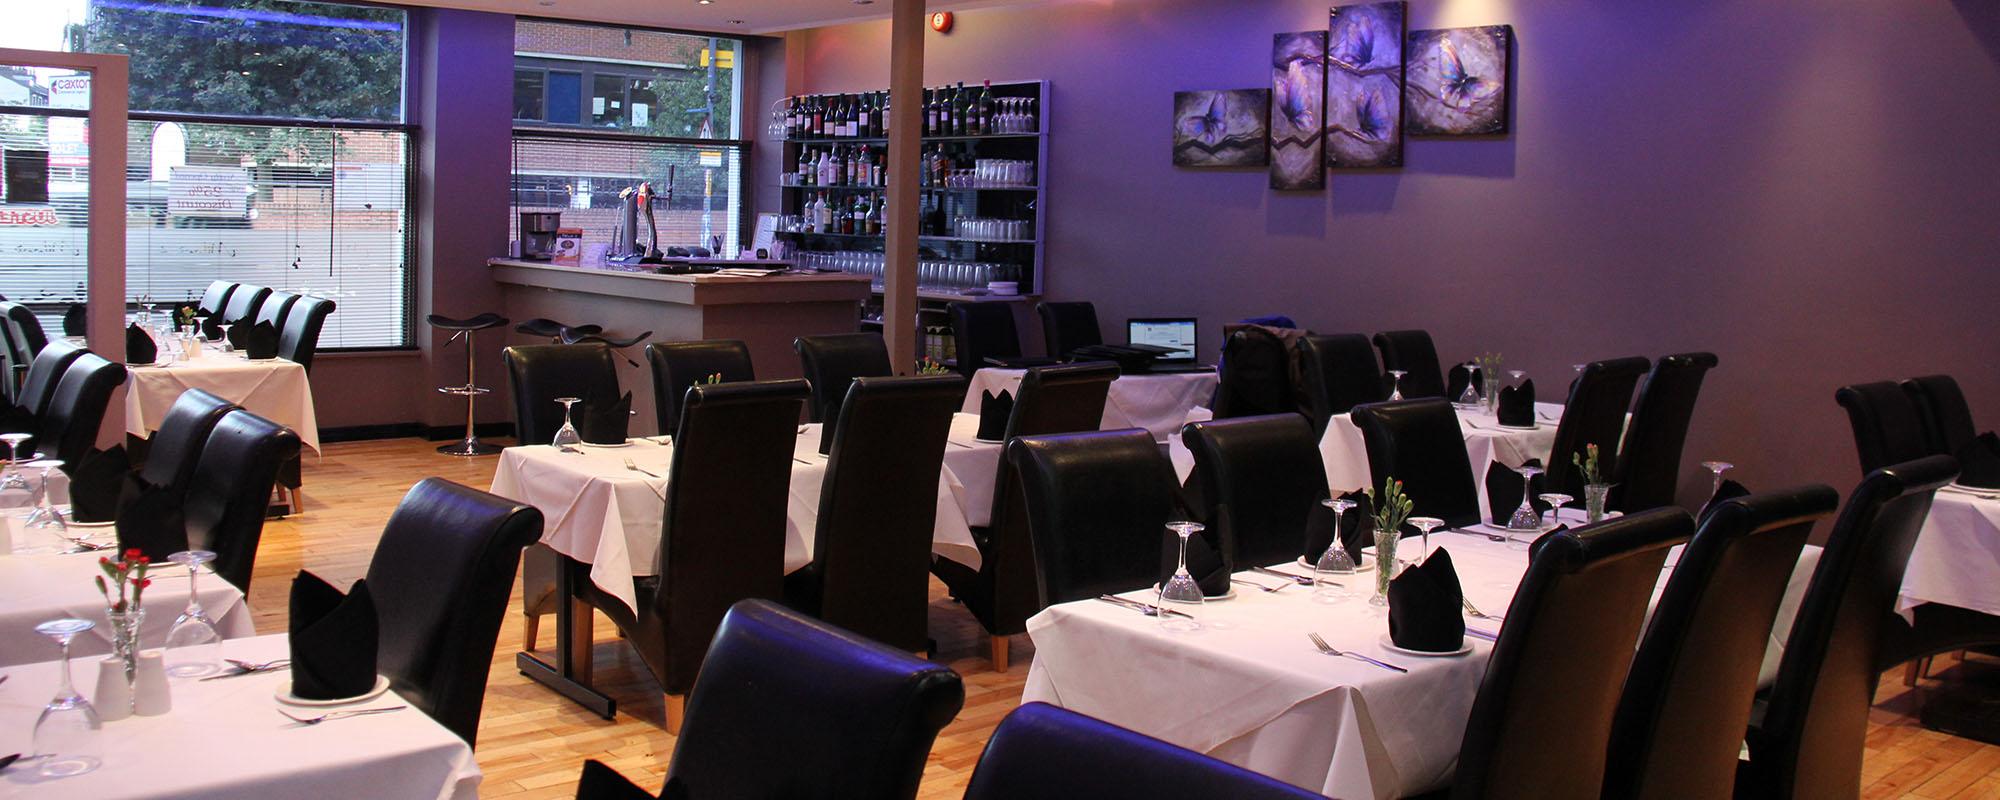 Restaurant & Takeaway milaad 2 da11